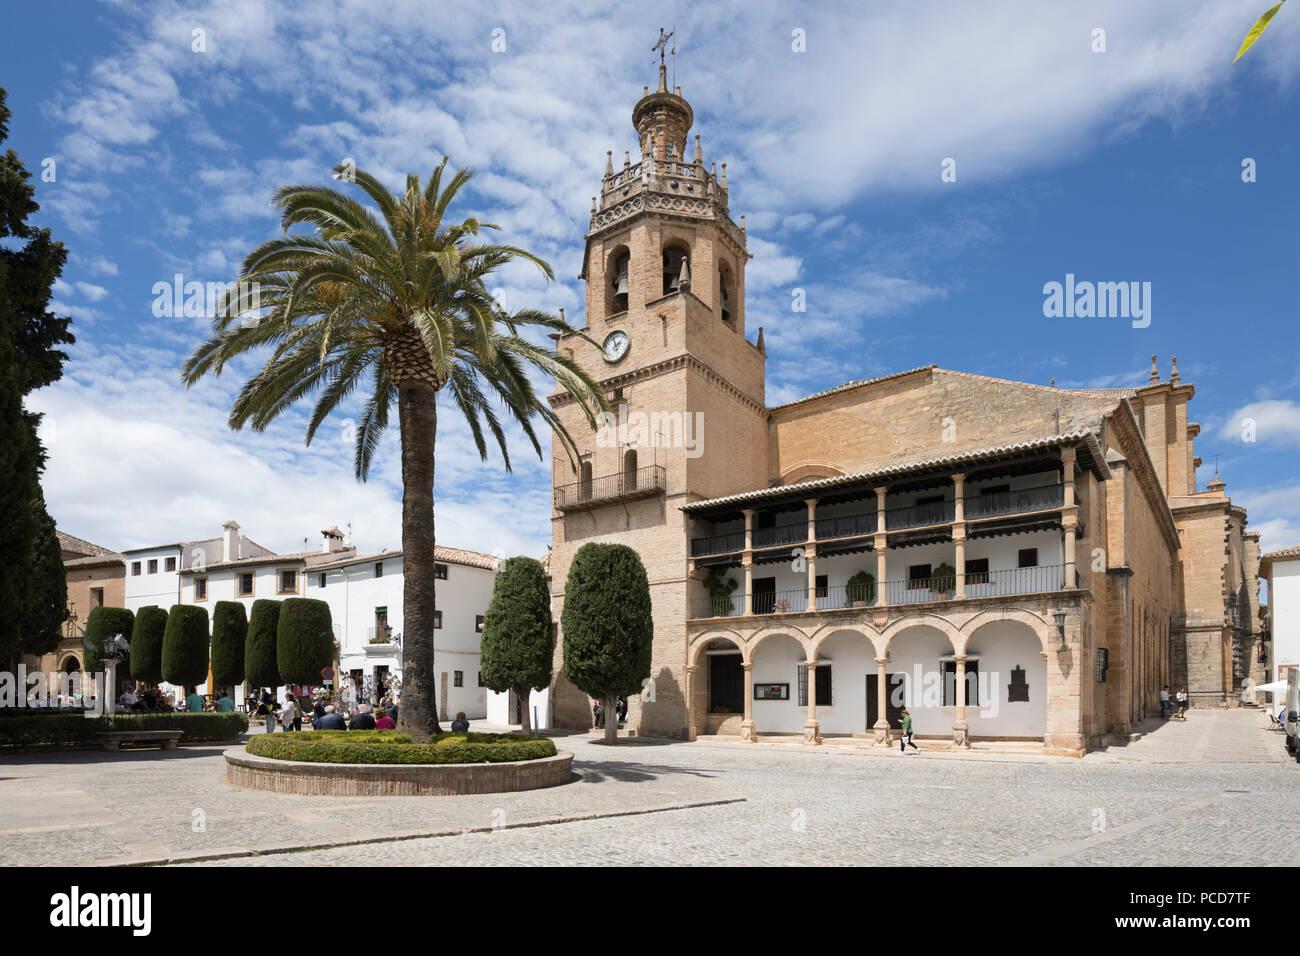 Iglesia de Santa Maria la Mayor in the Plaza Duquesa de Parcent (Town Hall Square), Ronda, Andalucia, Spain, Europe - Stock Image